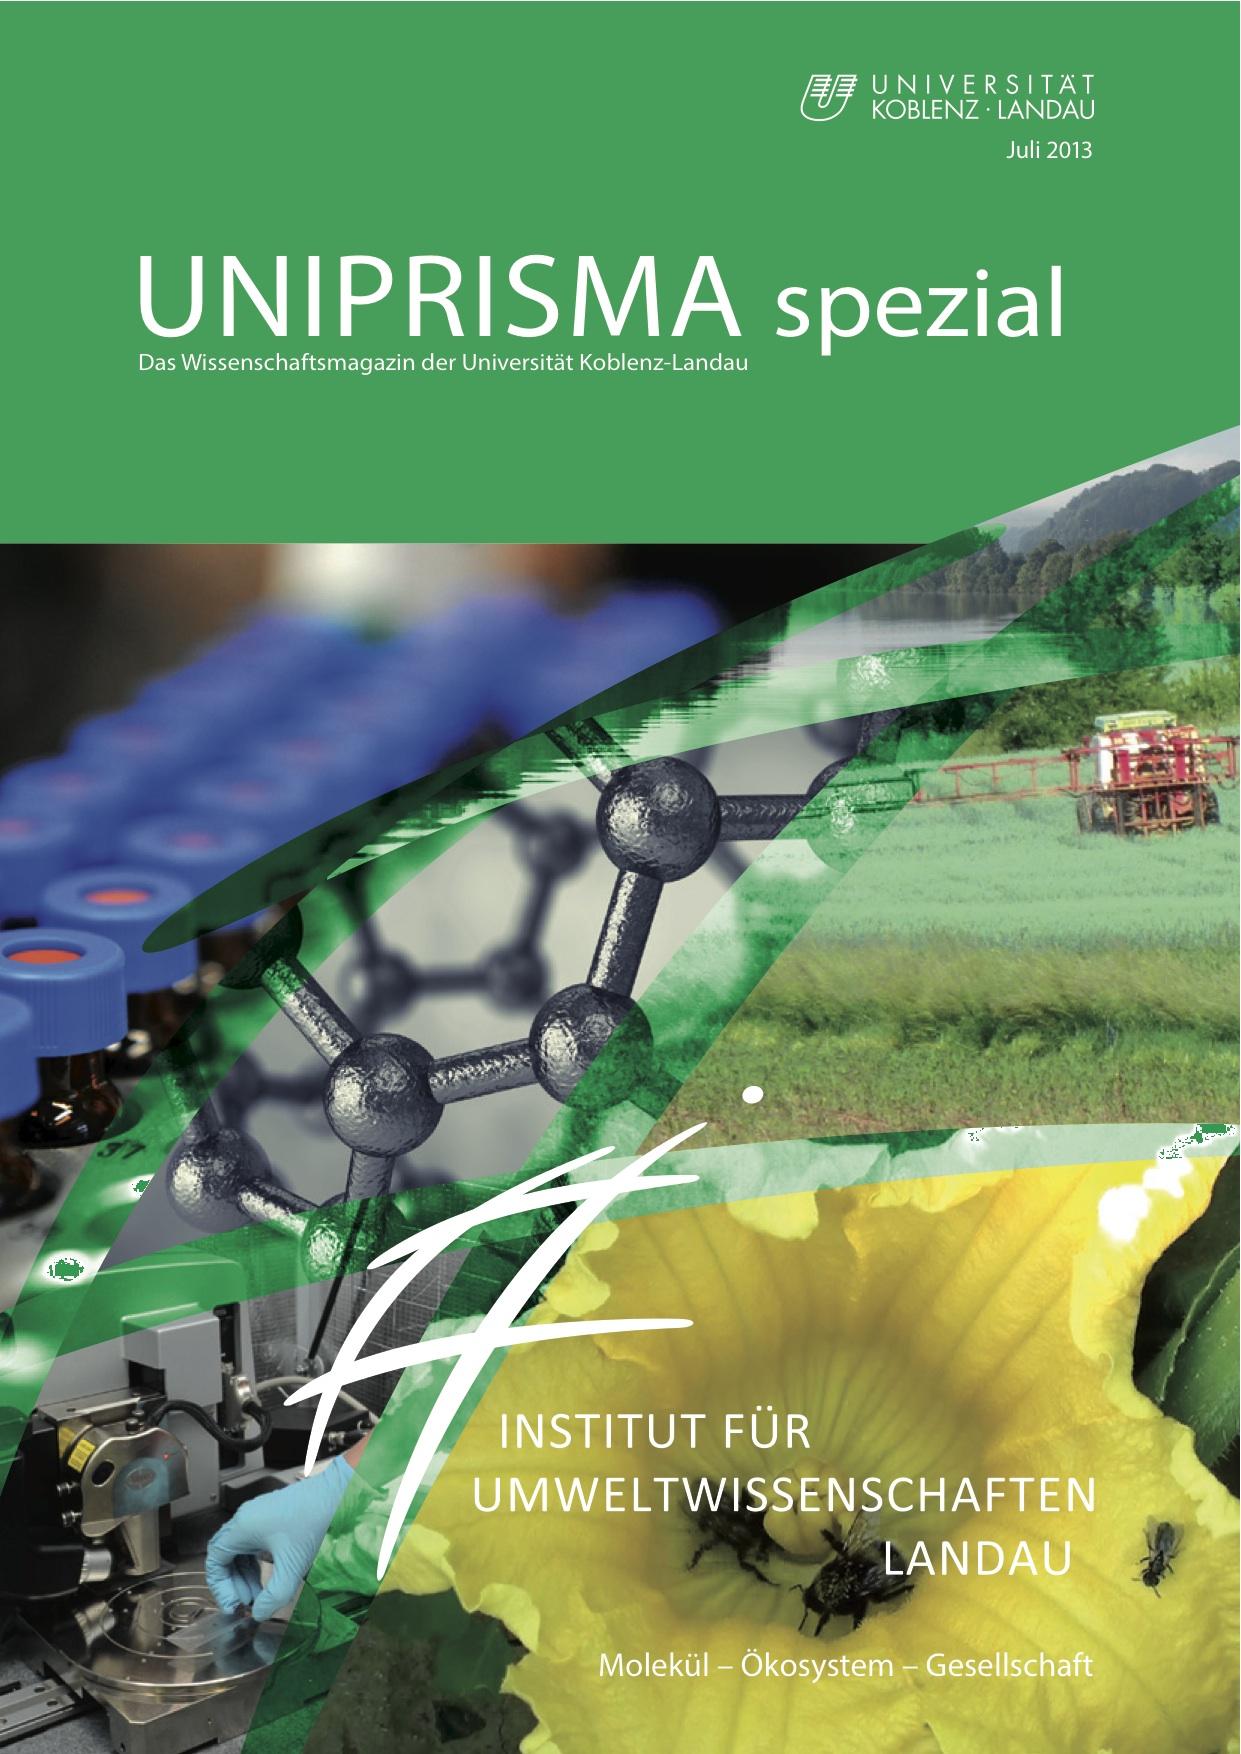 UNIPRISMA spezial - Deckblatt Juli 2013